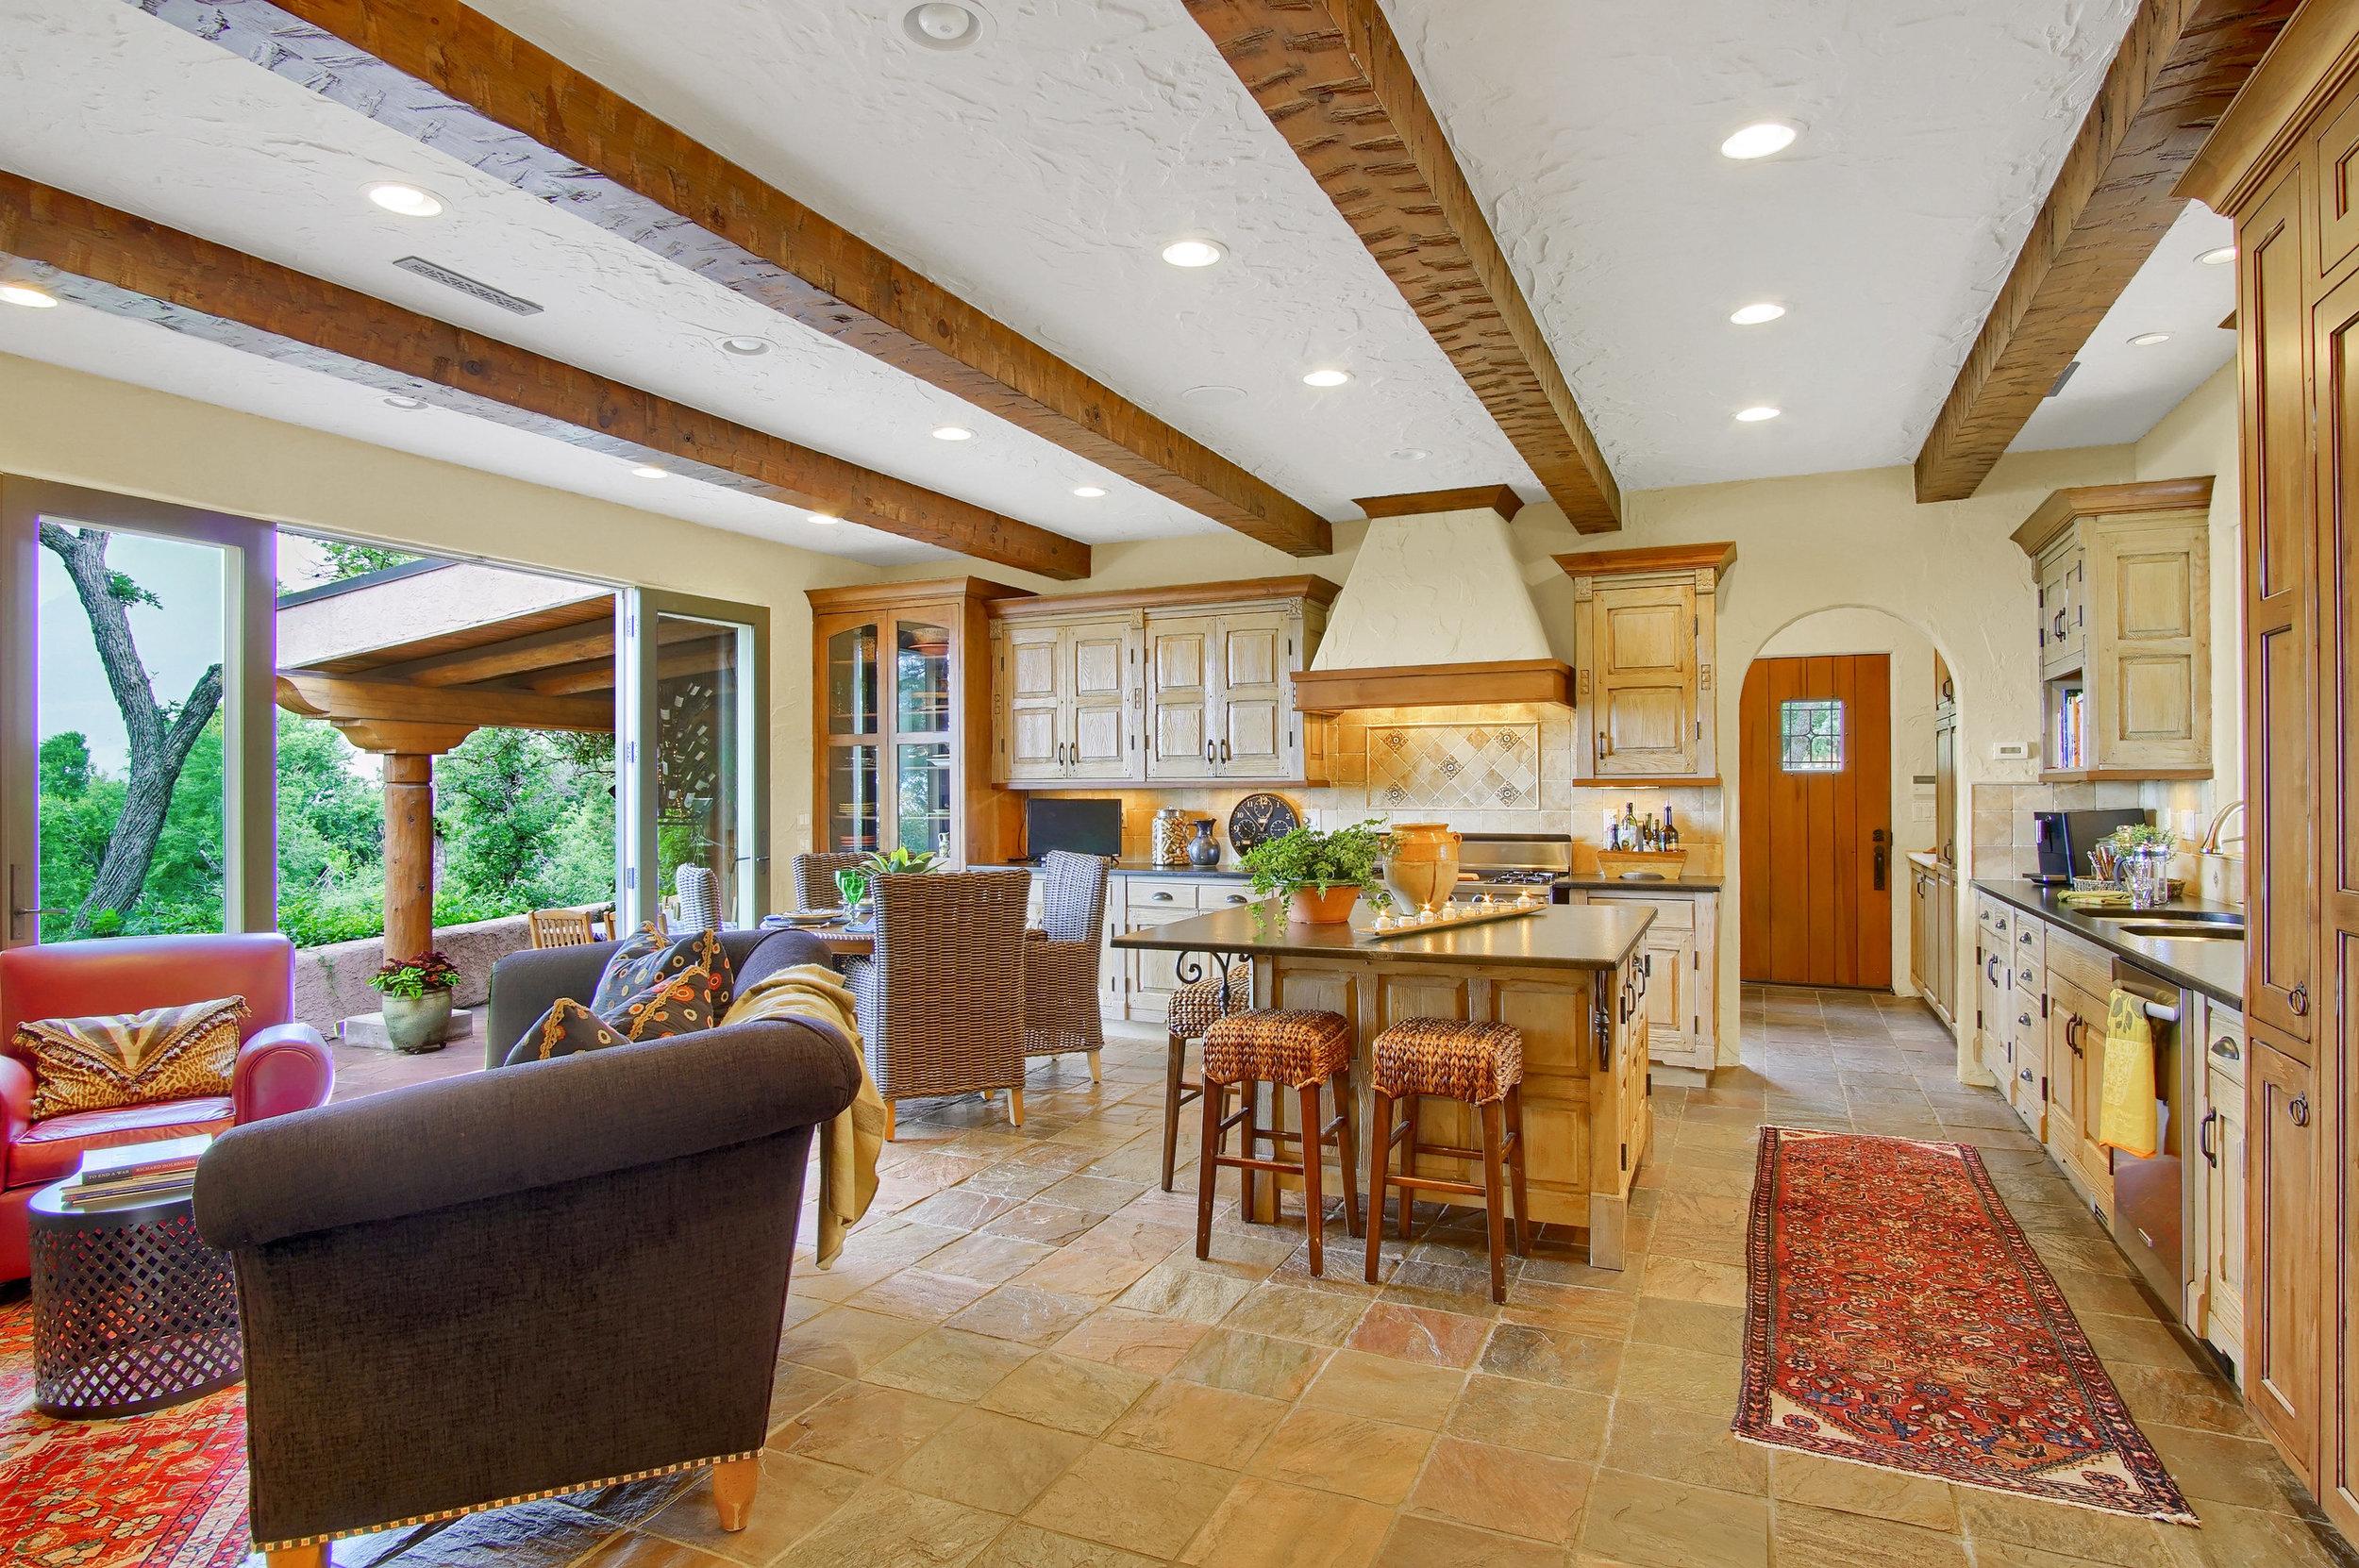 7 - Kitchen Opens to Rear Veranda with Pavilion.jpg